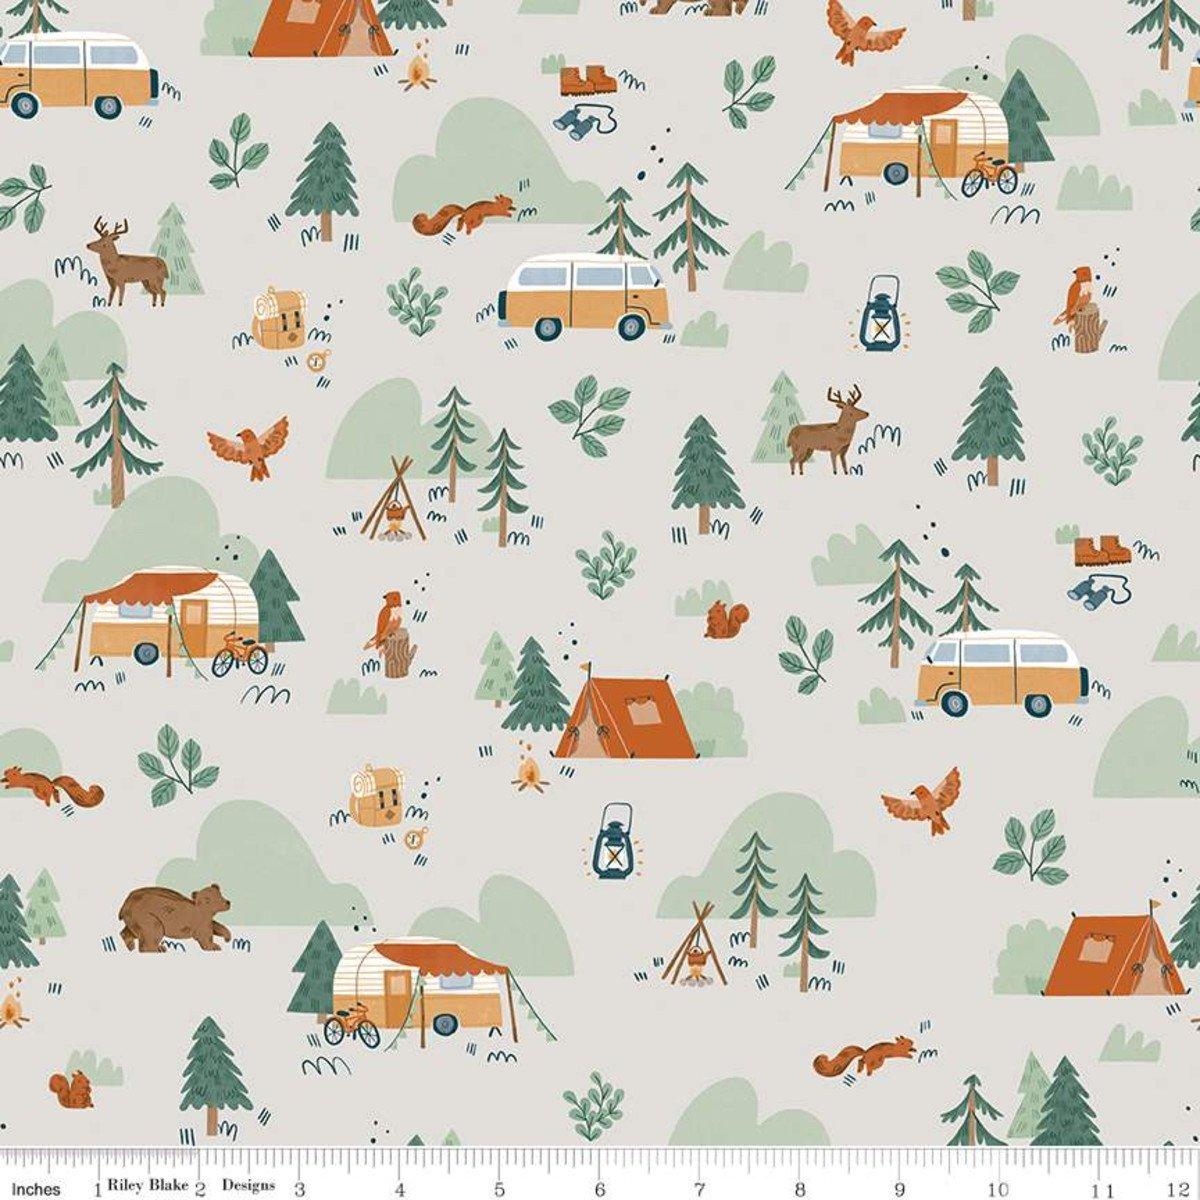 Camp Woodland Main Offwhite - C10460-OFFWHITE by Natàlia Juan Abelló for Riley Blake Designs